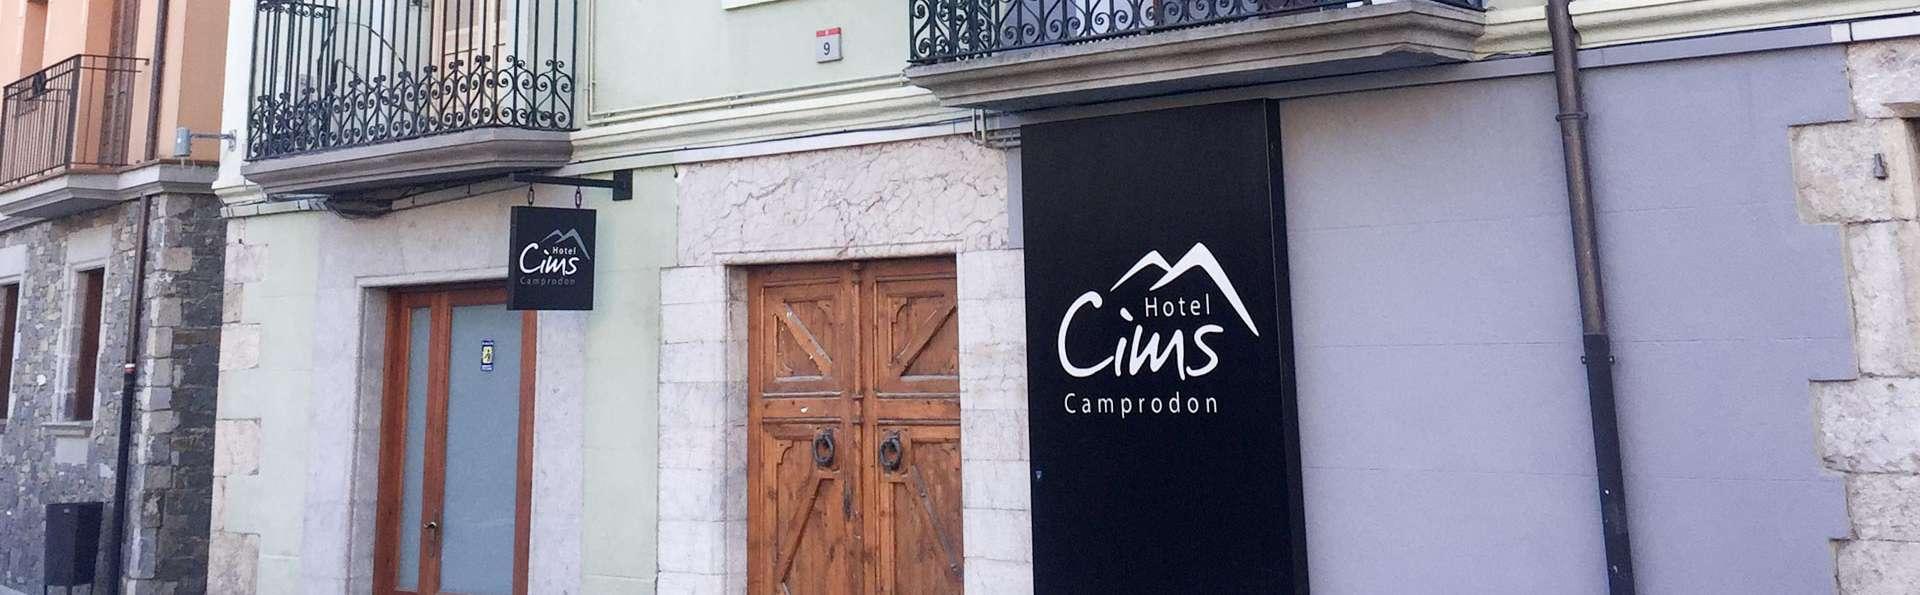 Hotel Cims de Camprodon - EDIT_FRONT_01.jpg